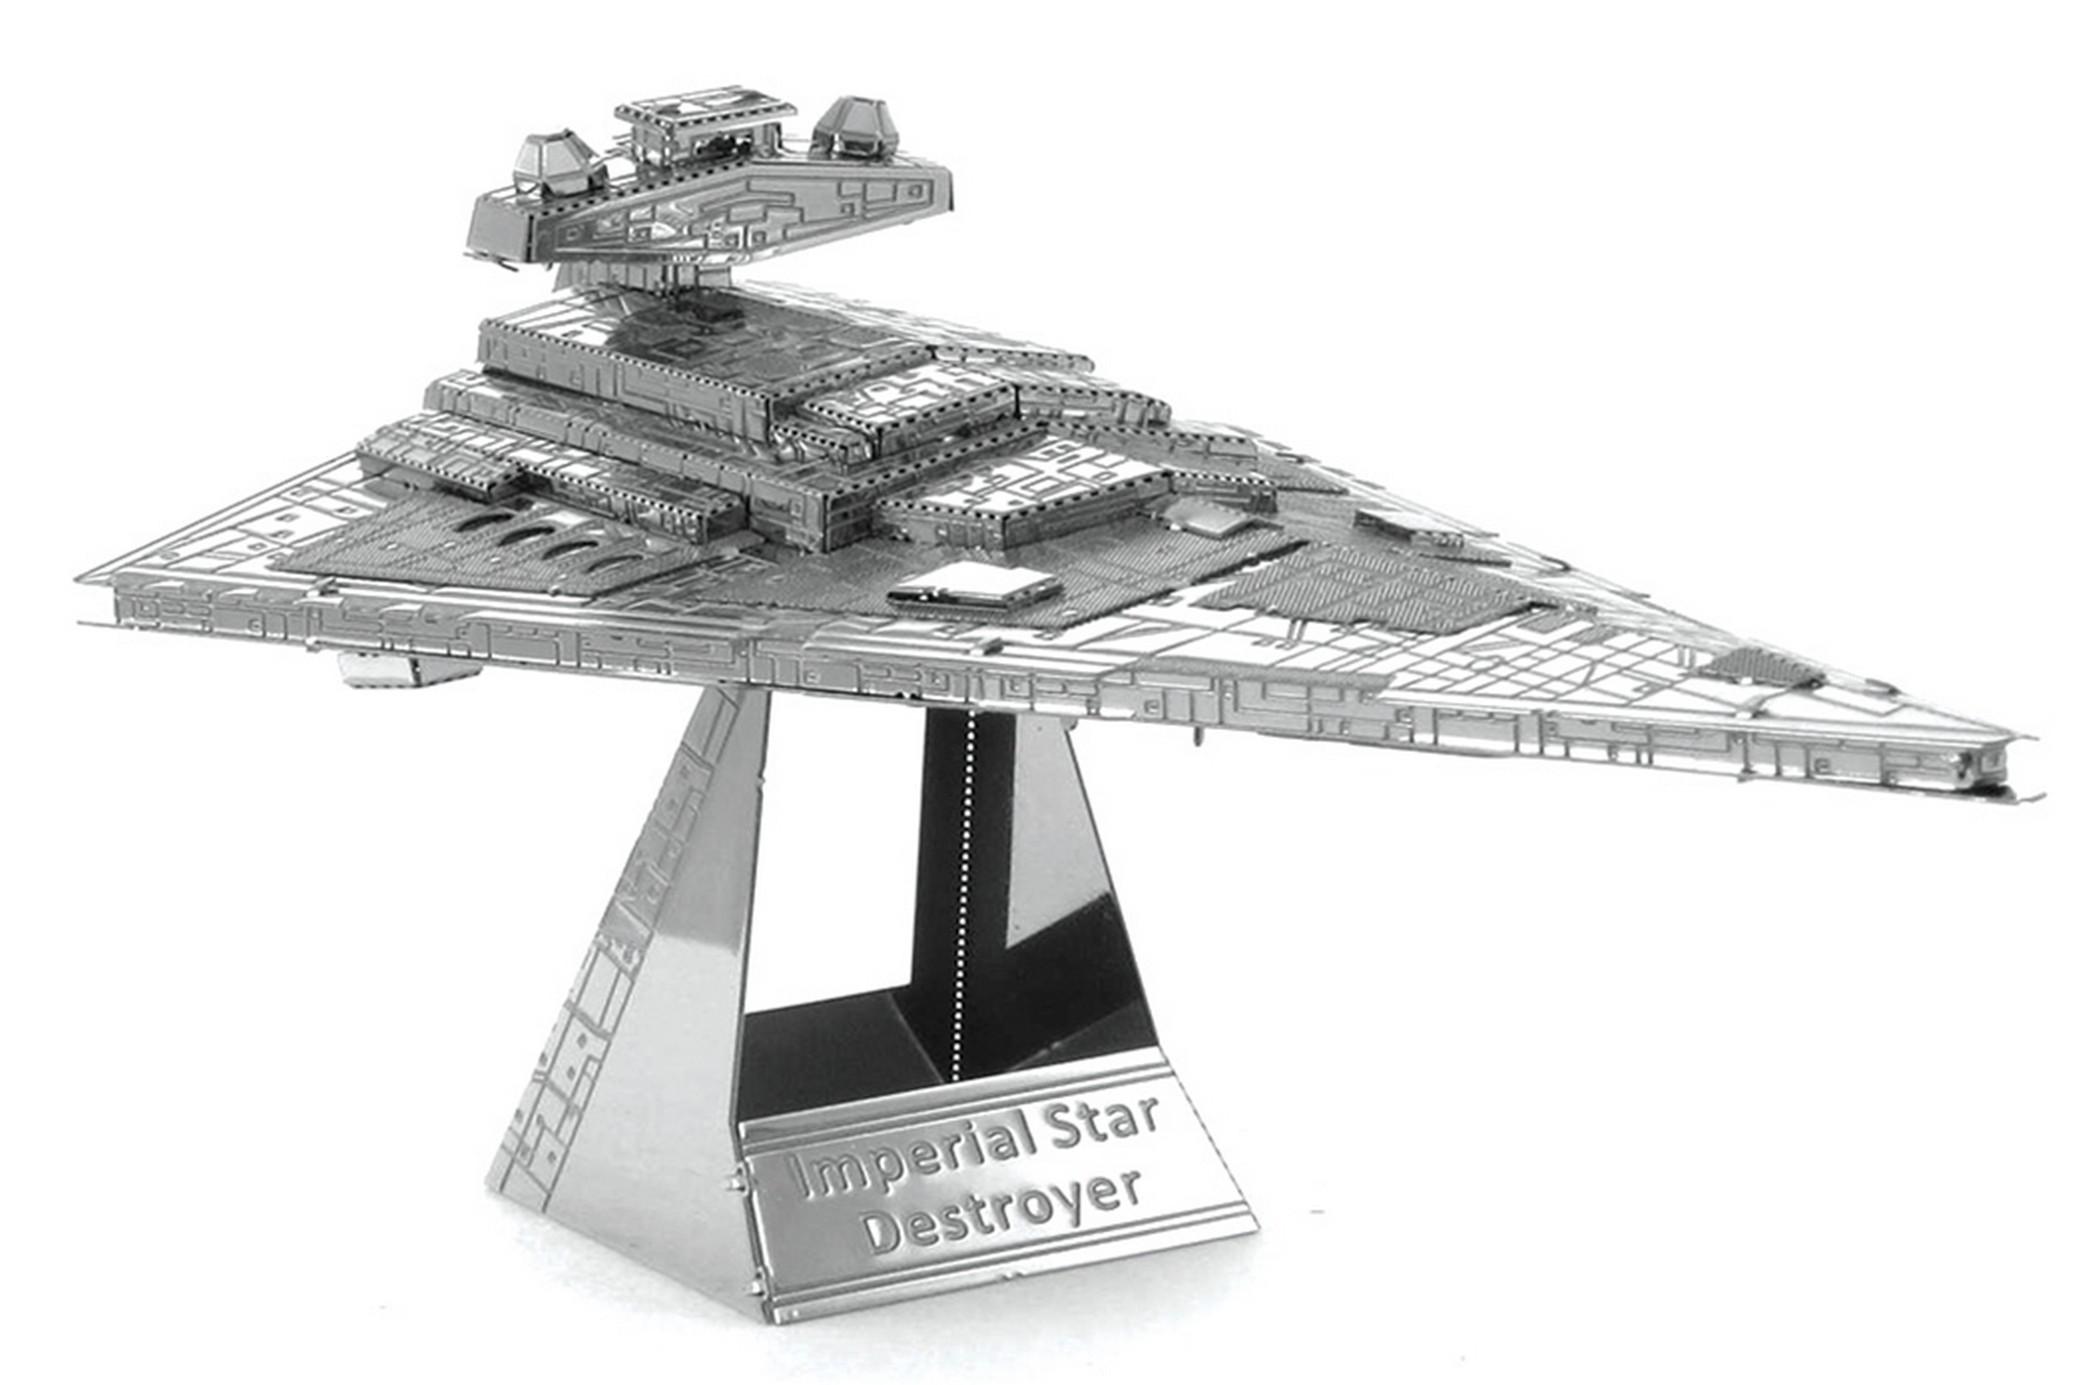 Disney Star Wars Imperial Star Destroyer 3D Metal Model Kit © Dizdude.com